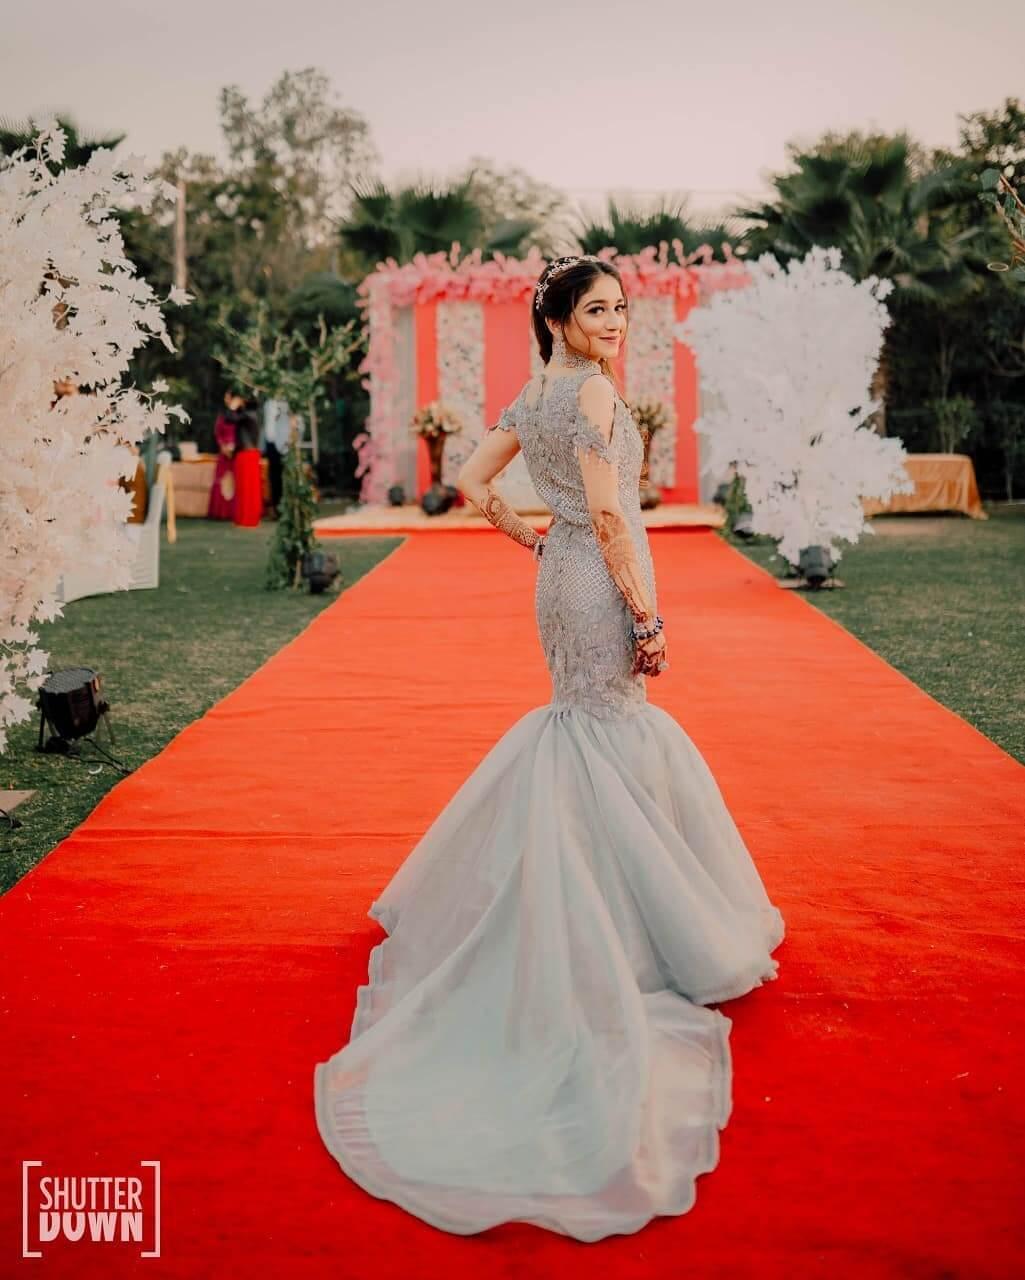 The Flattering Grey Mermaid Wedding Gown for wedding functions